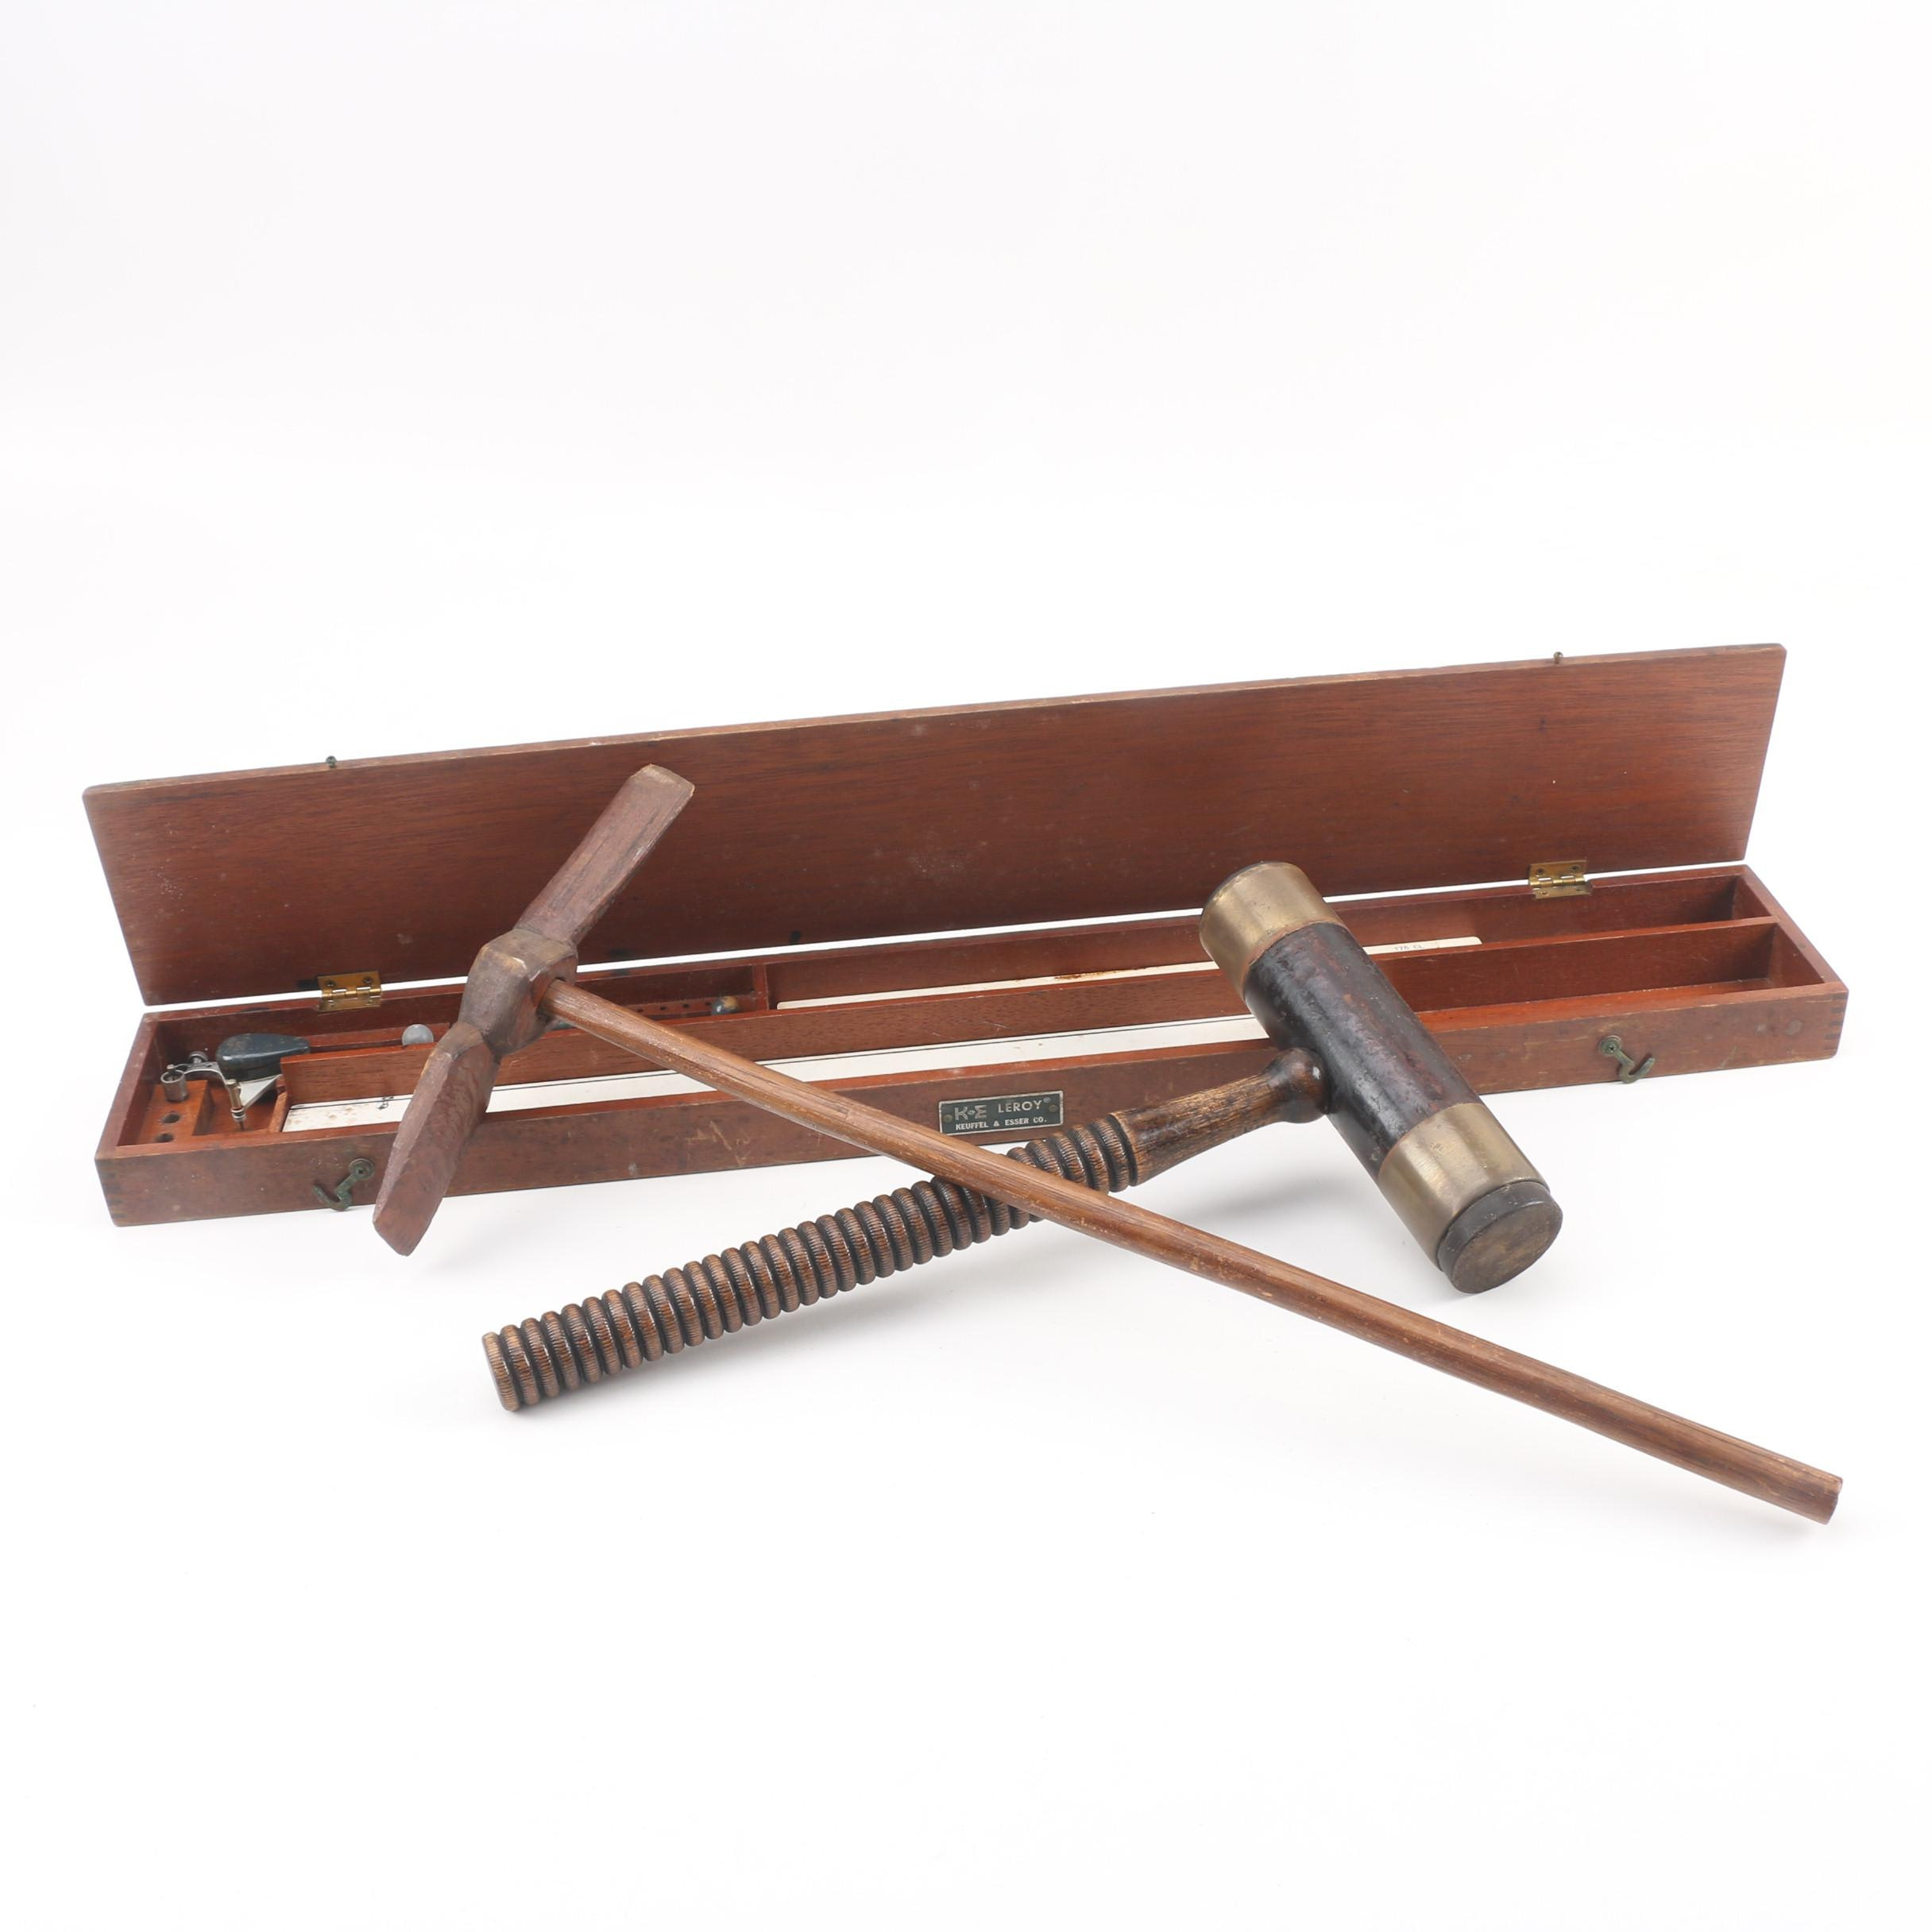 Vintage Keuffel & Esser Leroy Lettering Set, Gavel and Decorative Wood Pickaxe